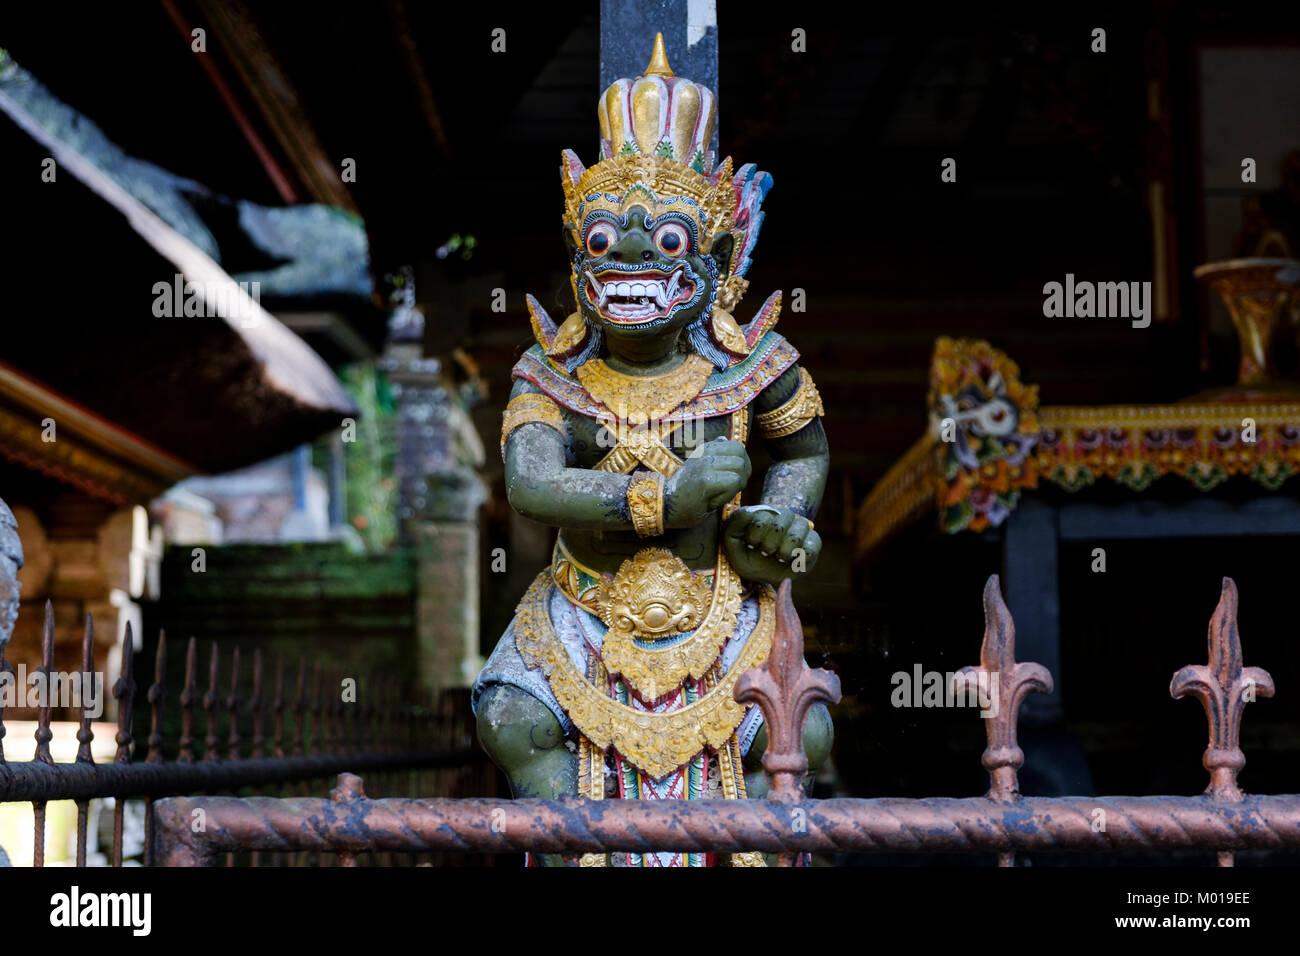 Traditional Balinese Hindu god or demon (unclear) statue at shrine in Gunung Kawi Sebatu Temple, Bali, Indonesia. - Stock Image